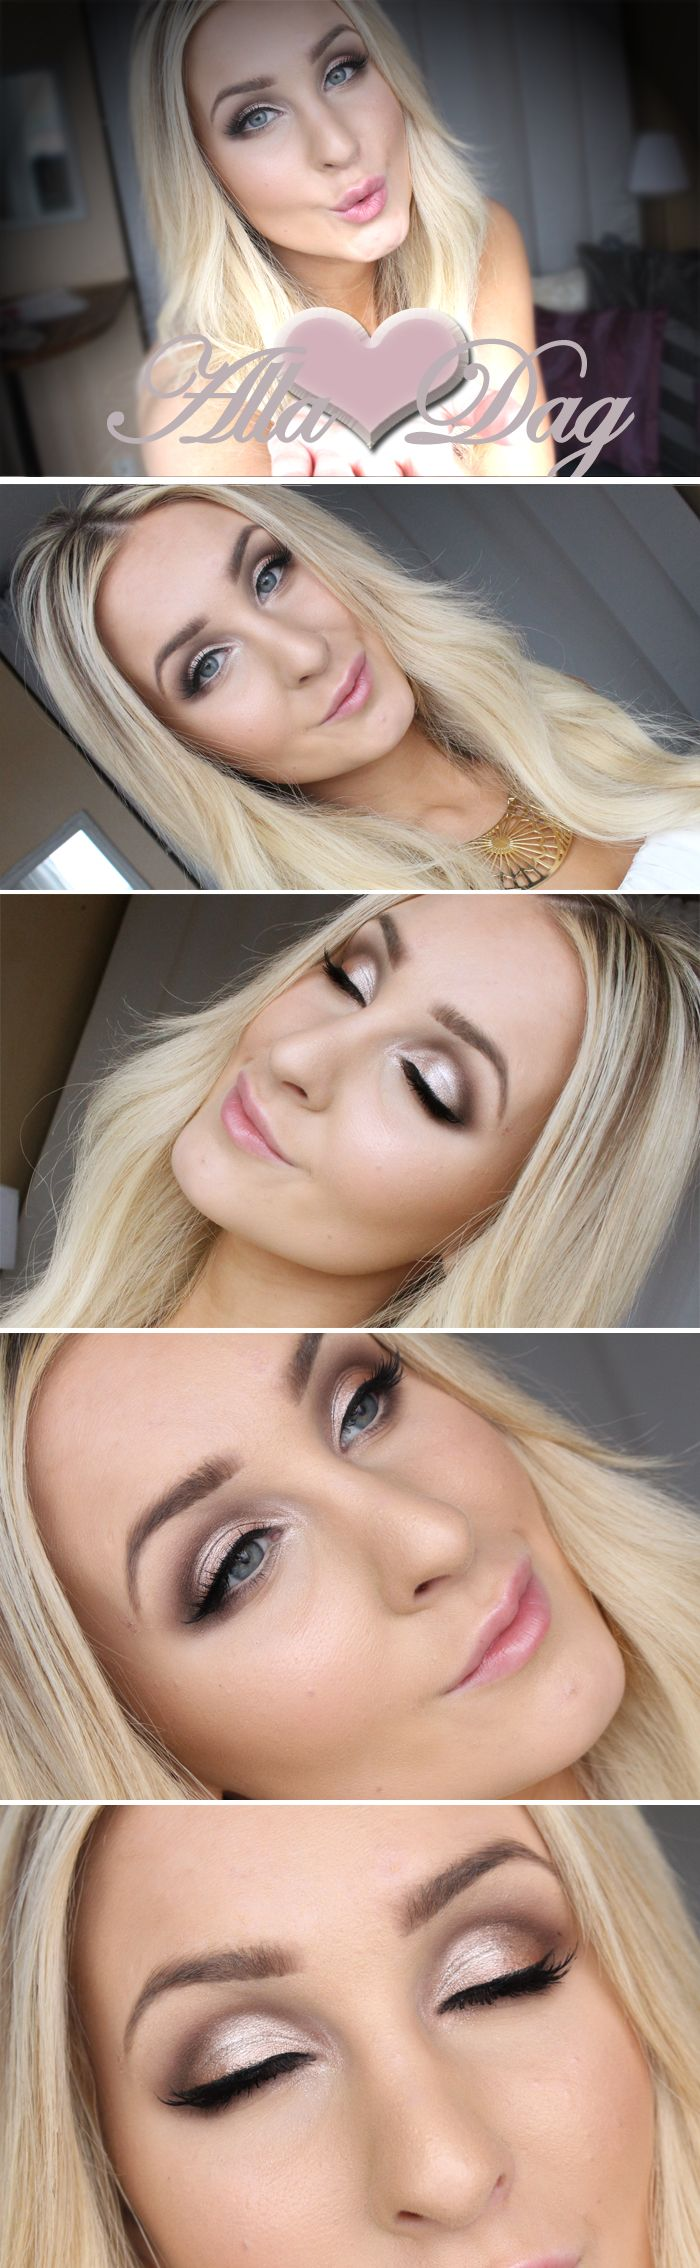 Makeup for Valentines day | Helen Torsgården – Hiilens sminkblogg